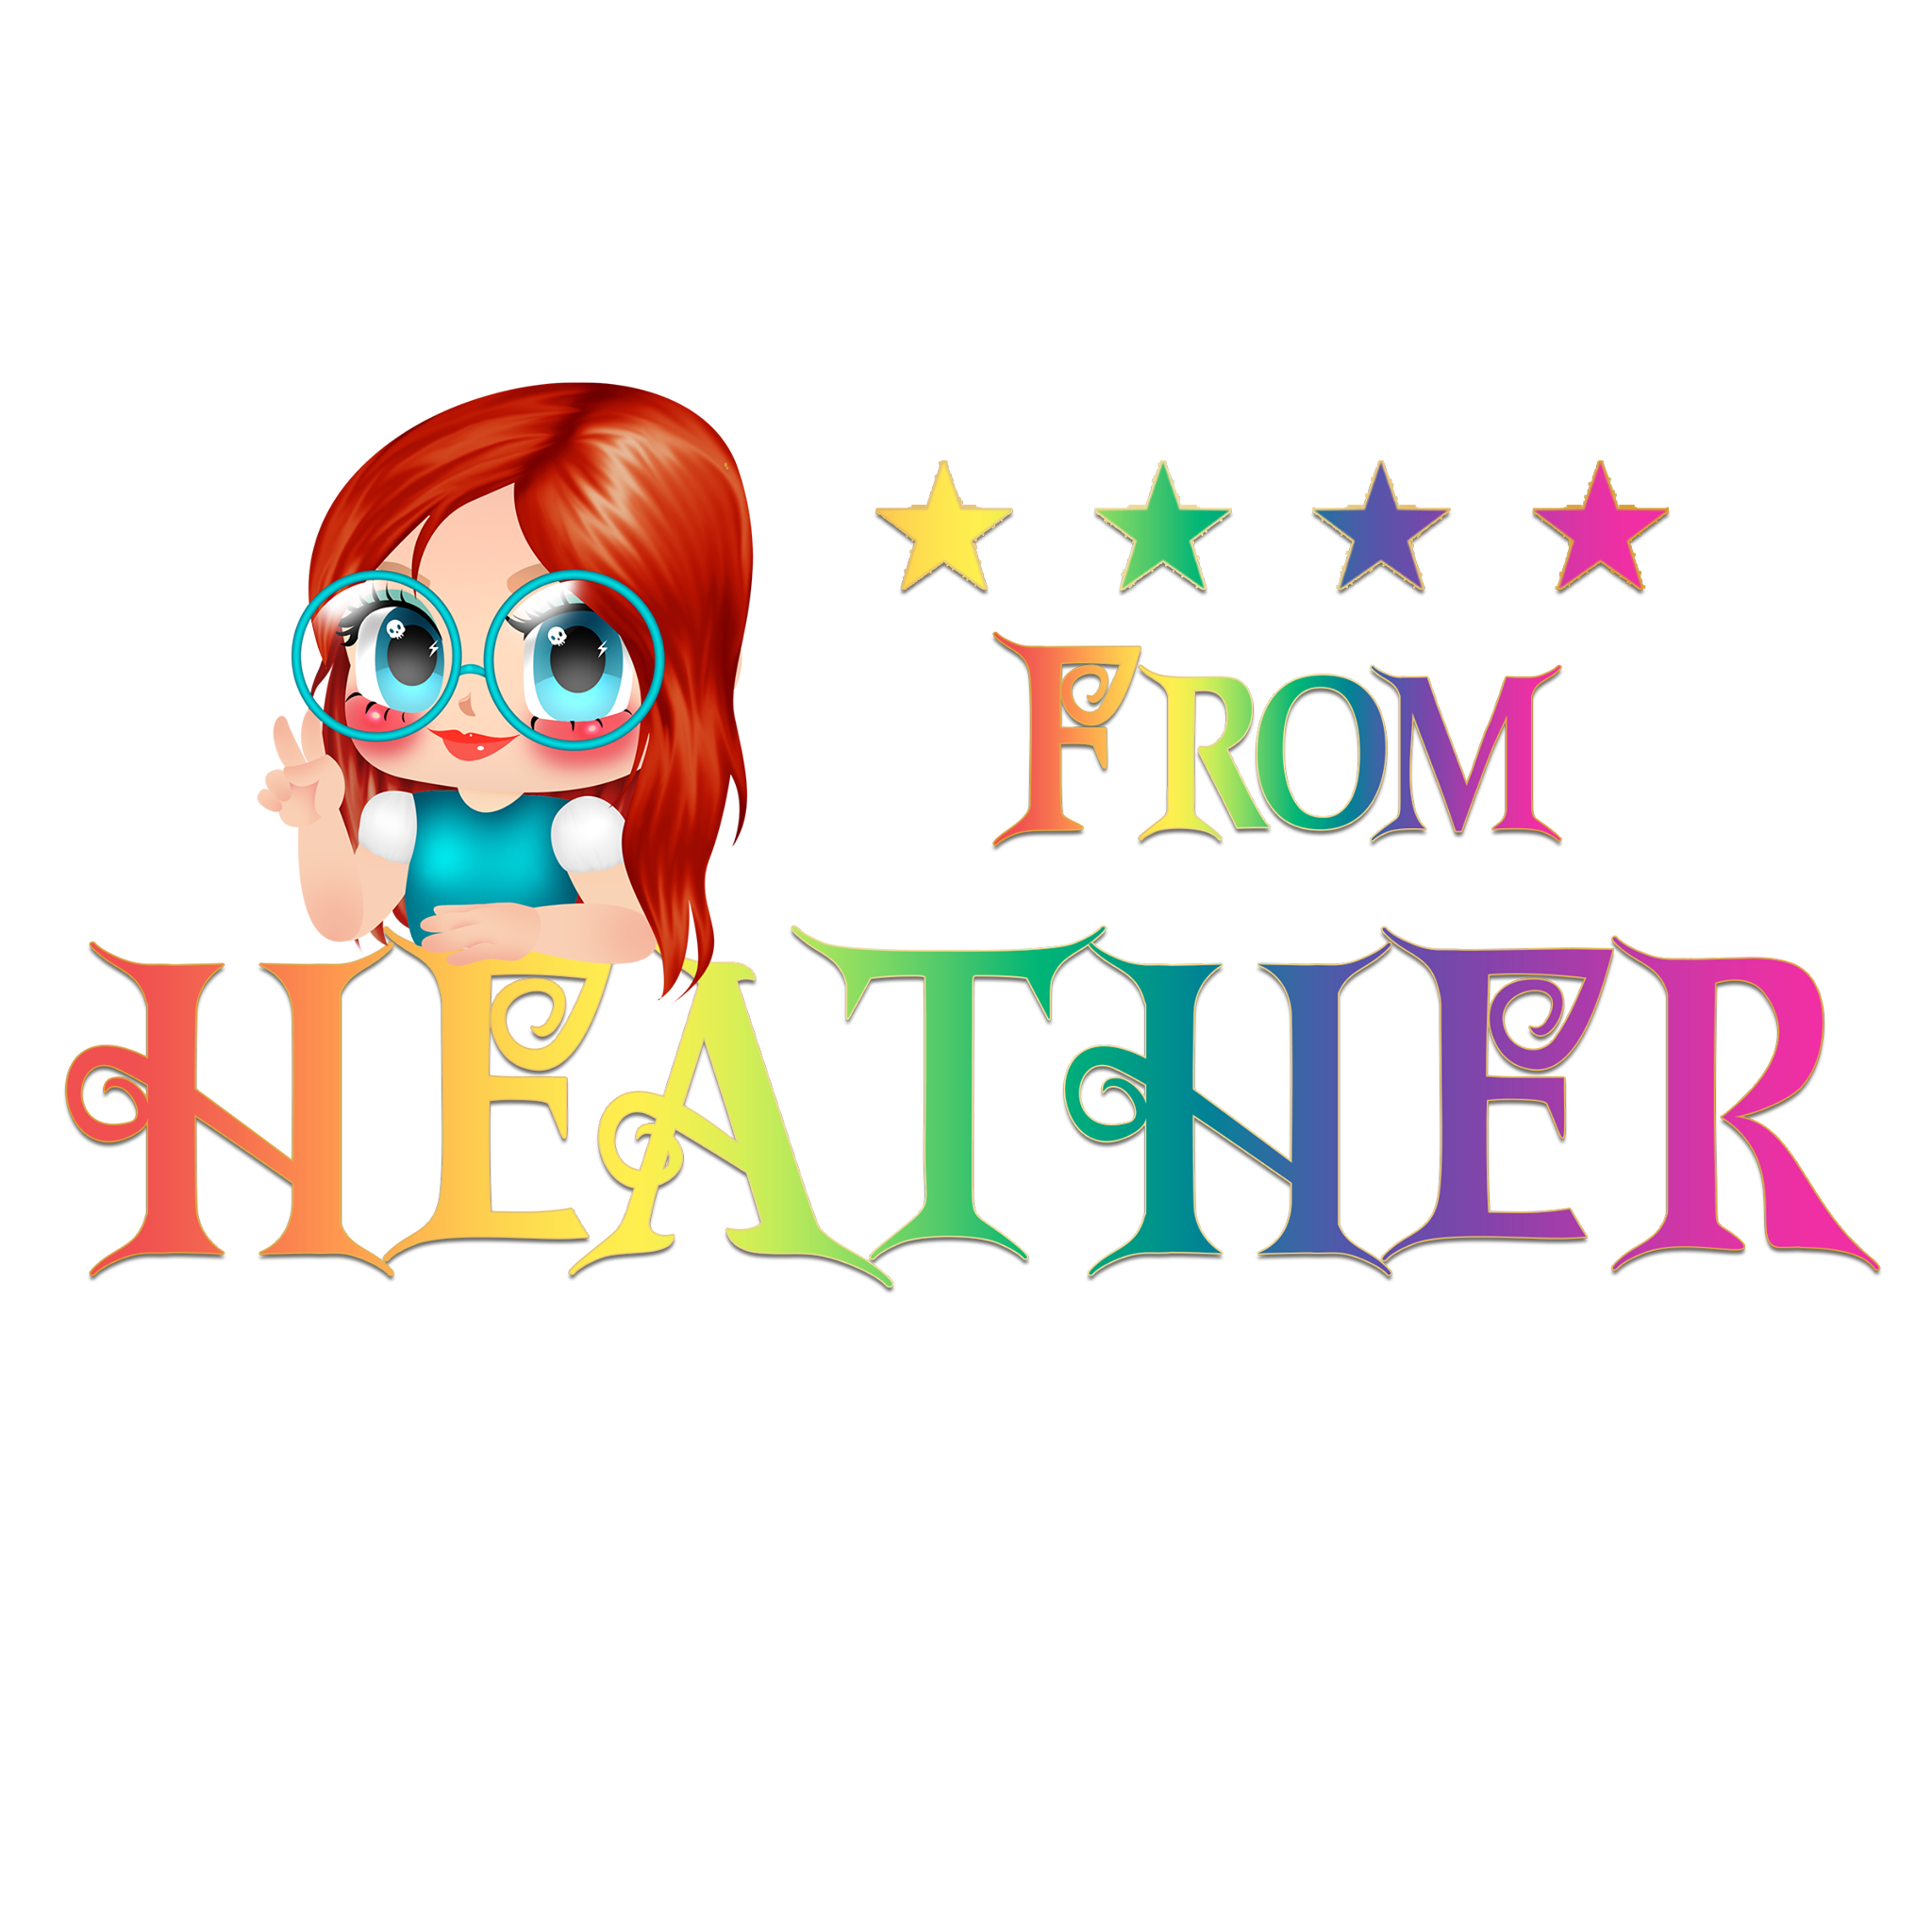 4 stars Heather